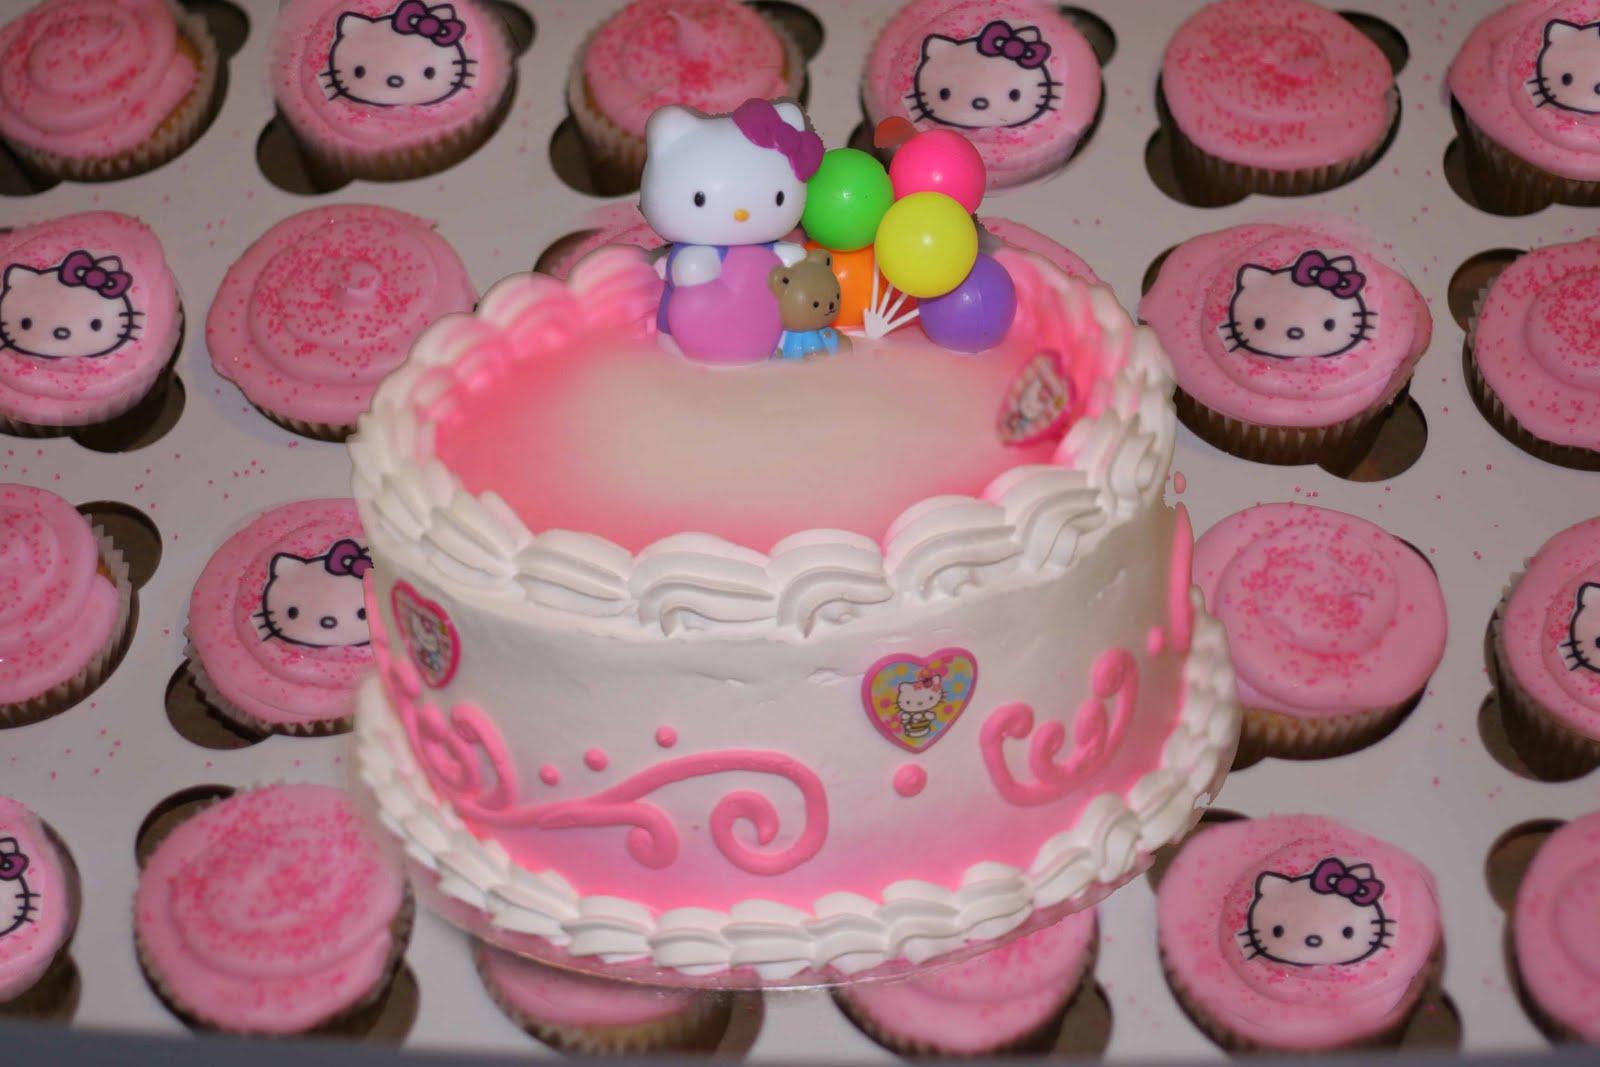 Hectors Custom Cakes Hello Kitty Cake With Cupcakes